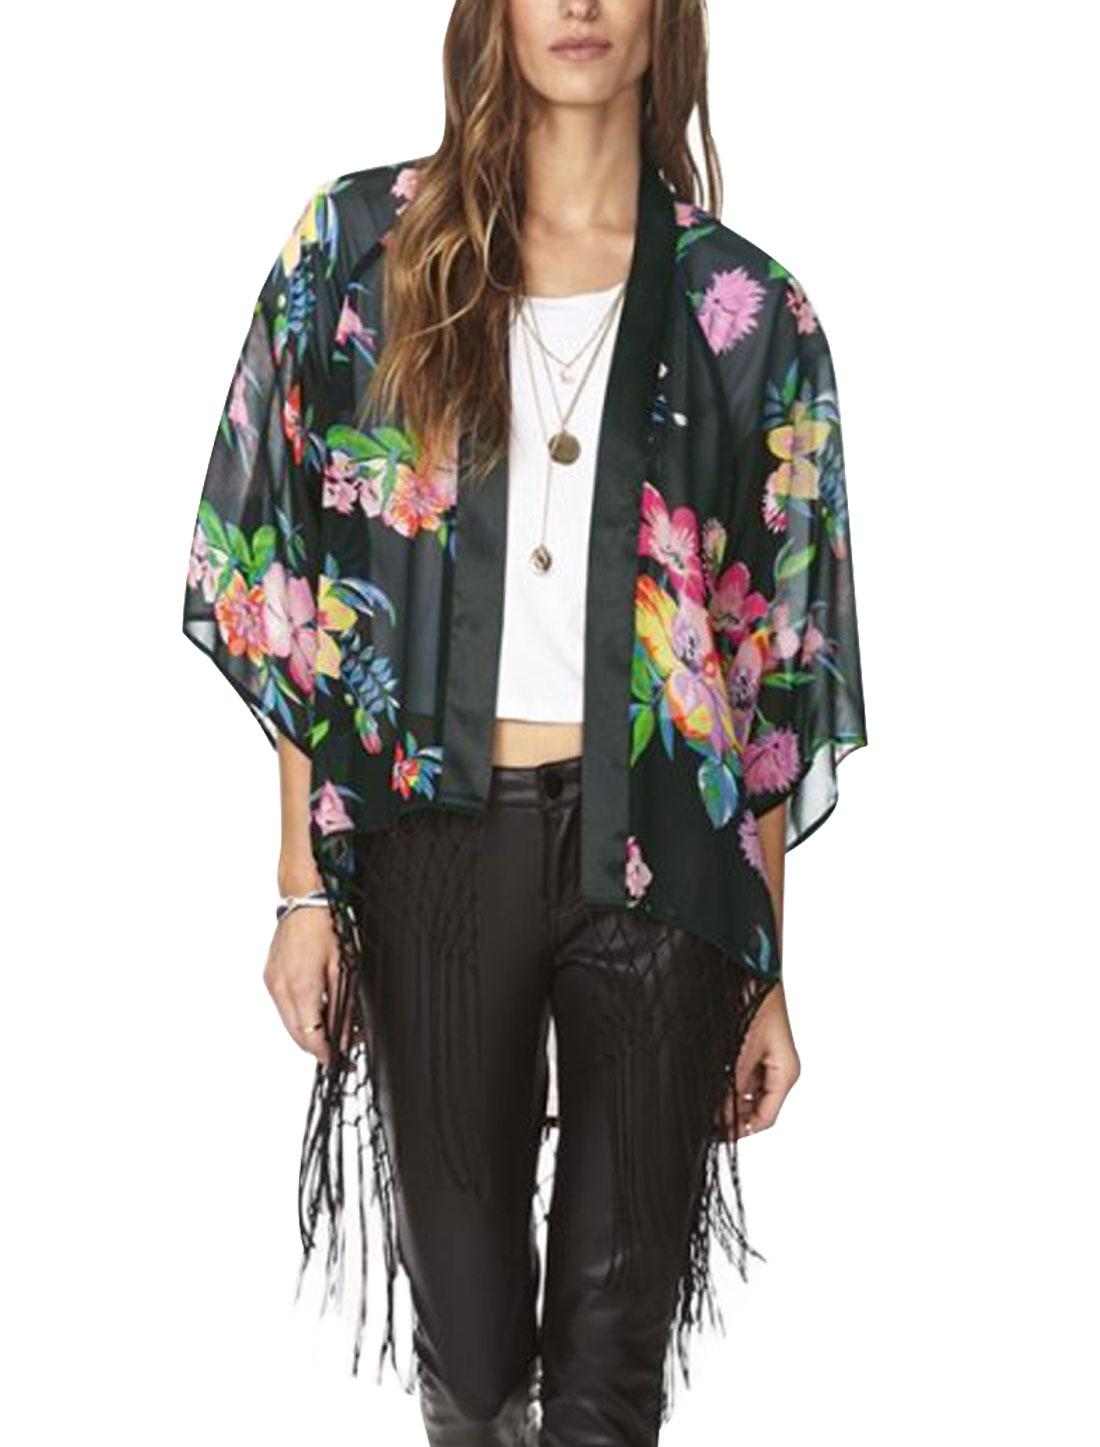 Woman Floral Prints 3/4 Batwing Sleeves Fringed Trim Chiffon Kimono Black XS